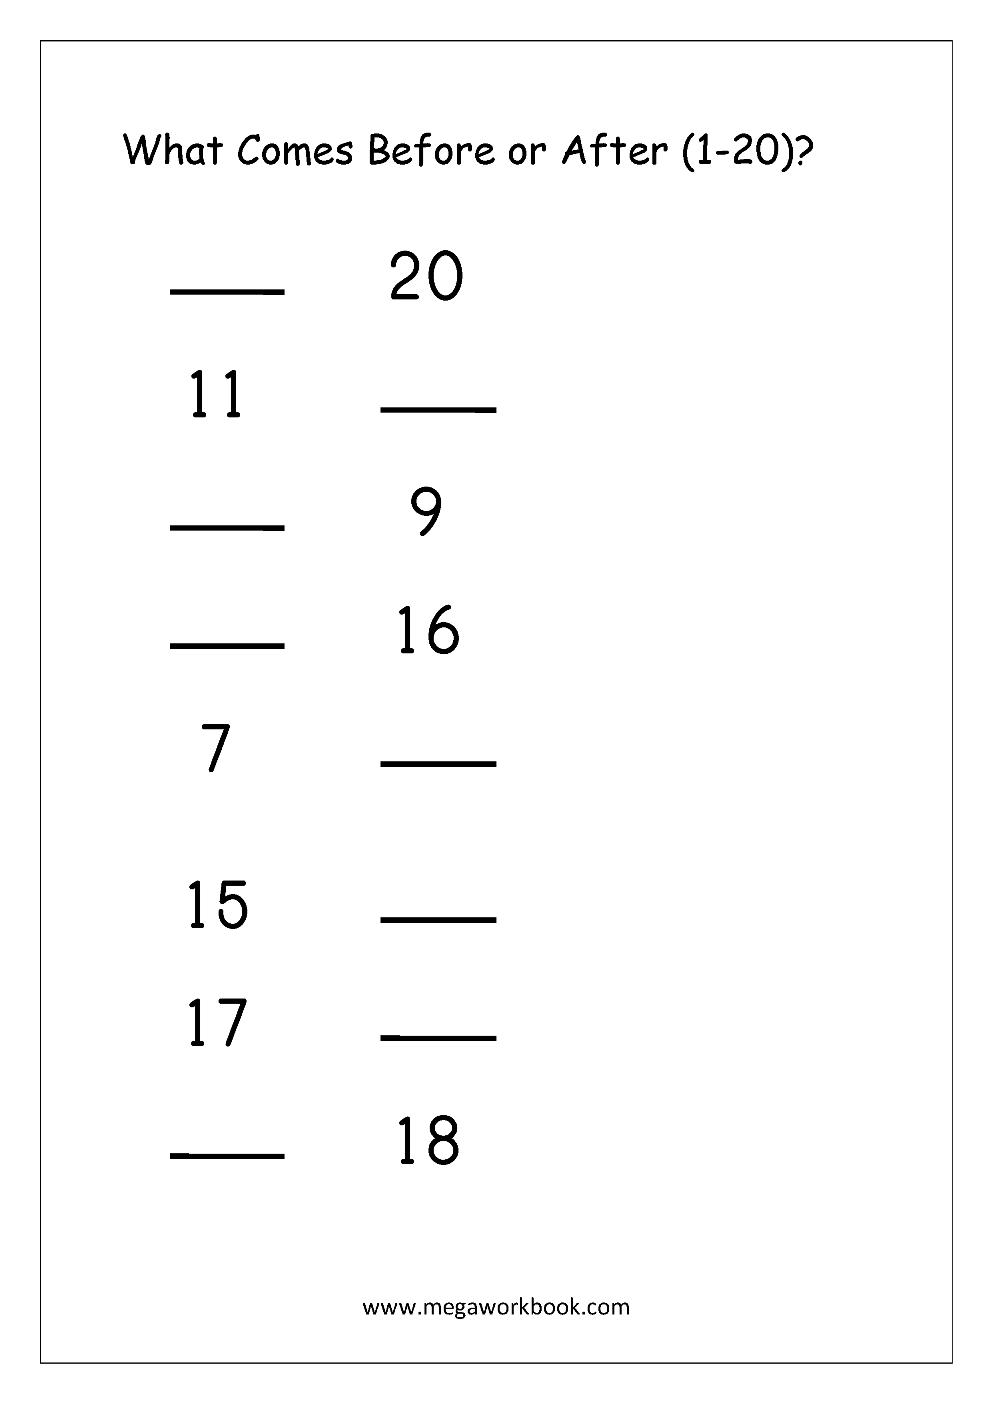 Free Math Worksheets - Number Order - Missing Numbers - MegaWorkbook